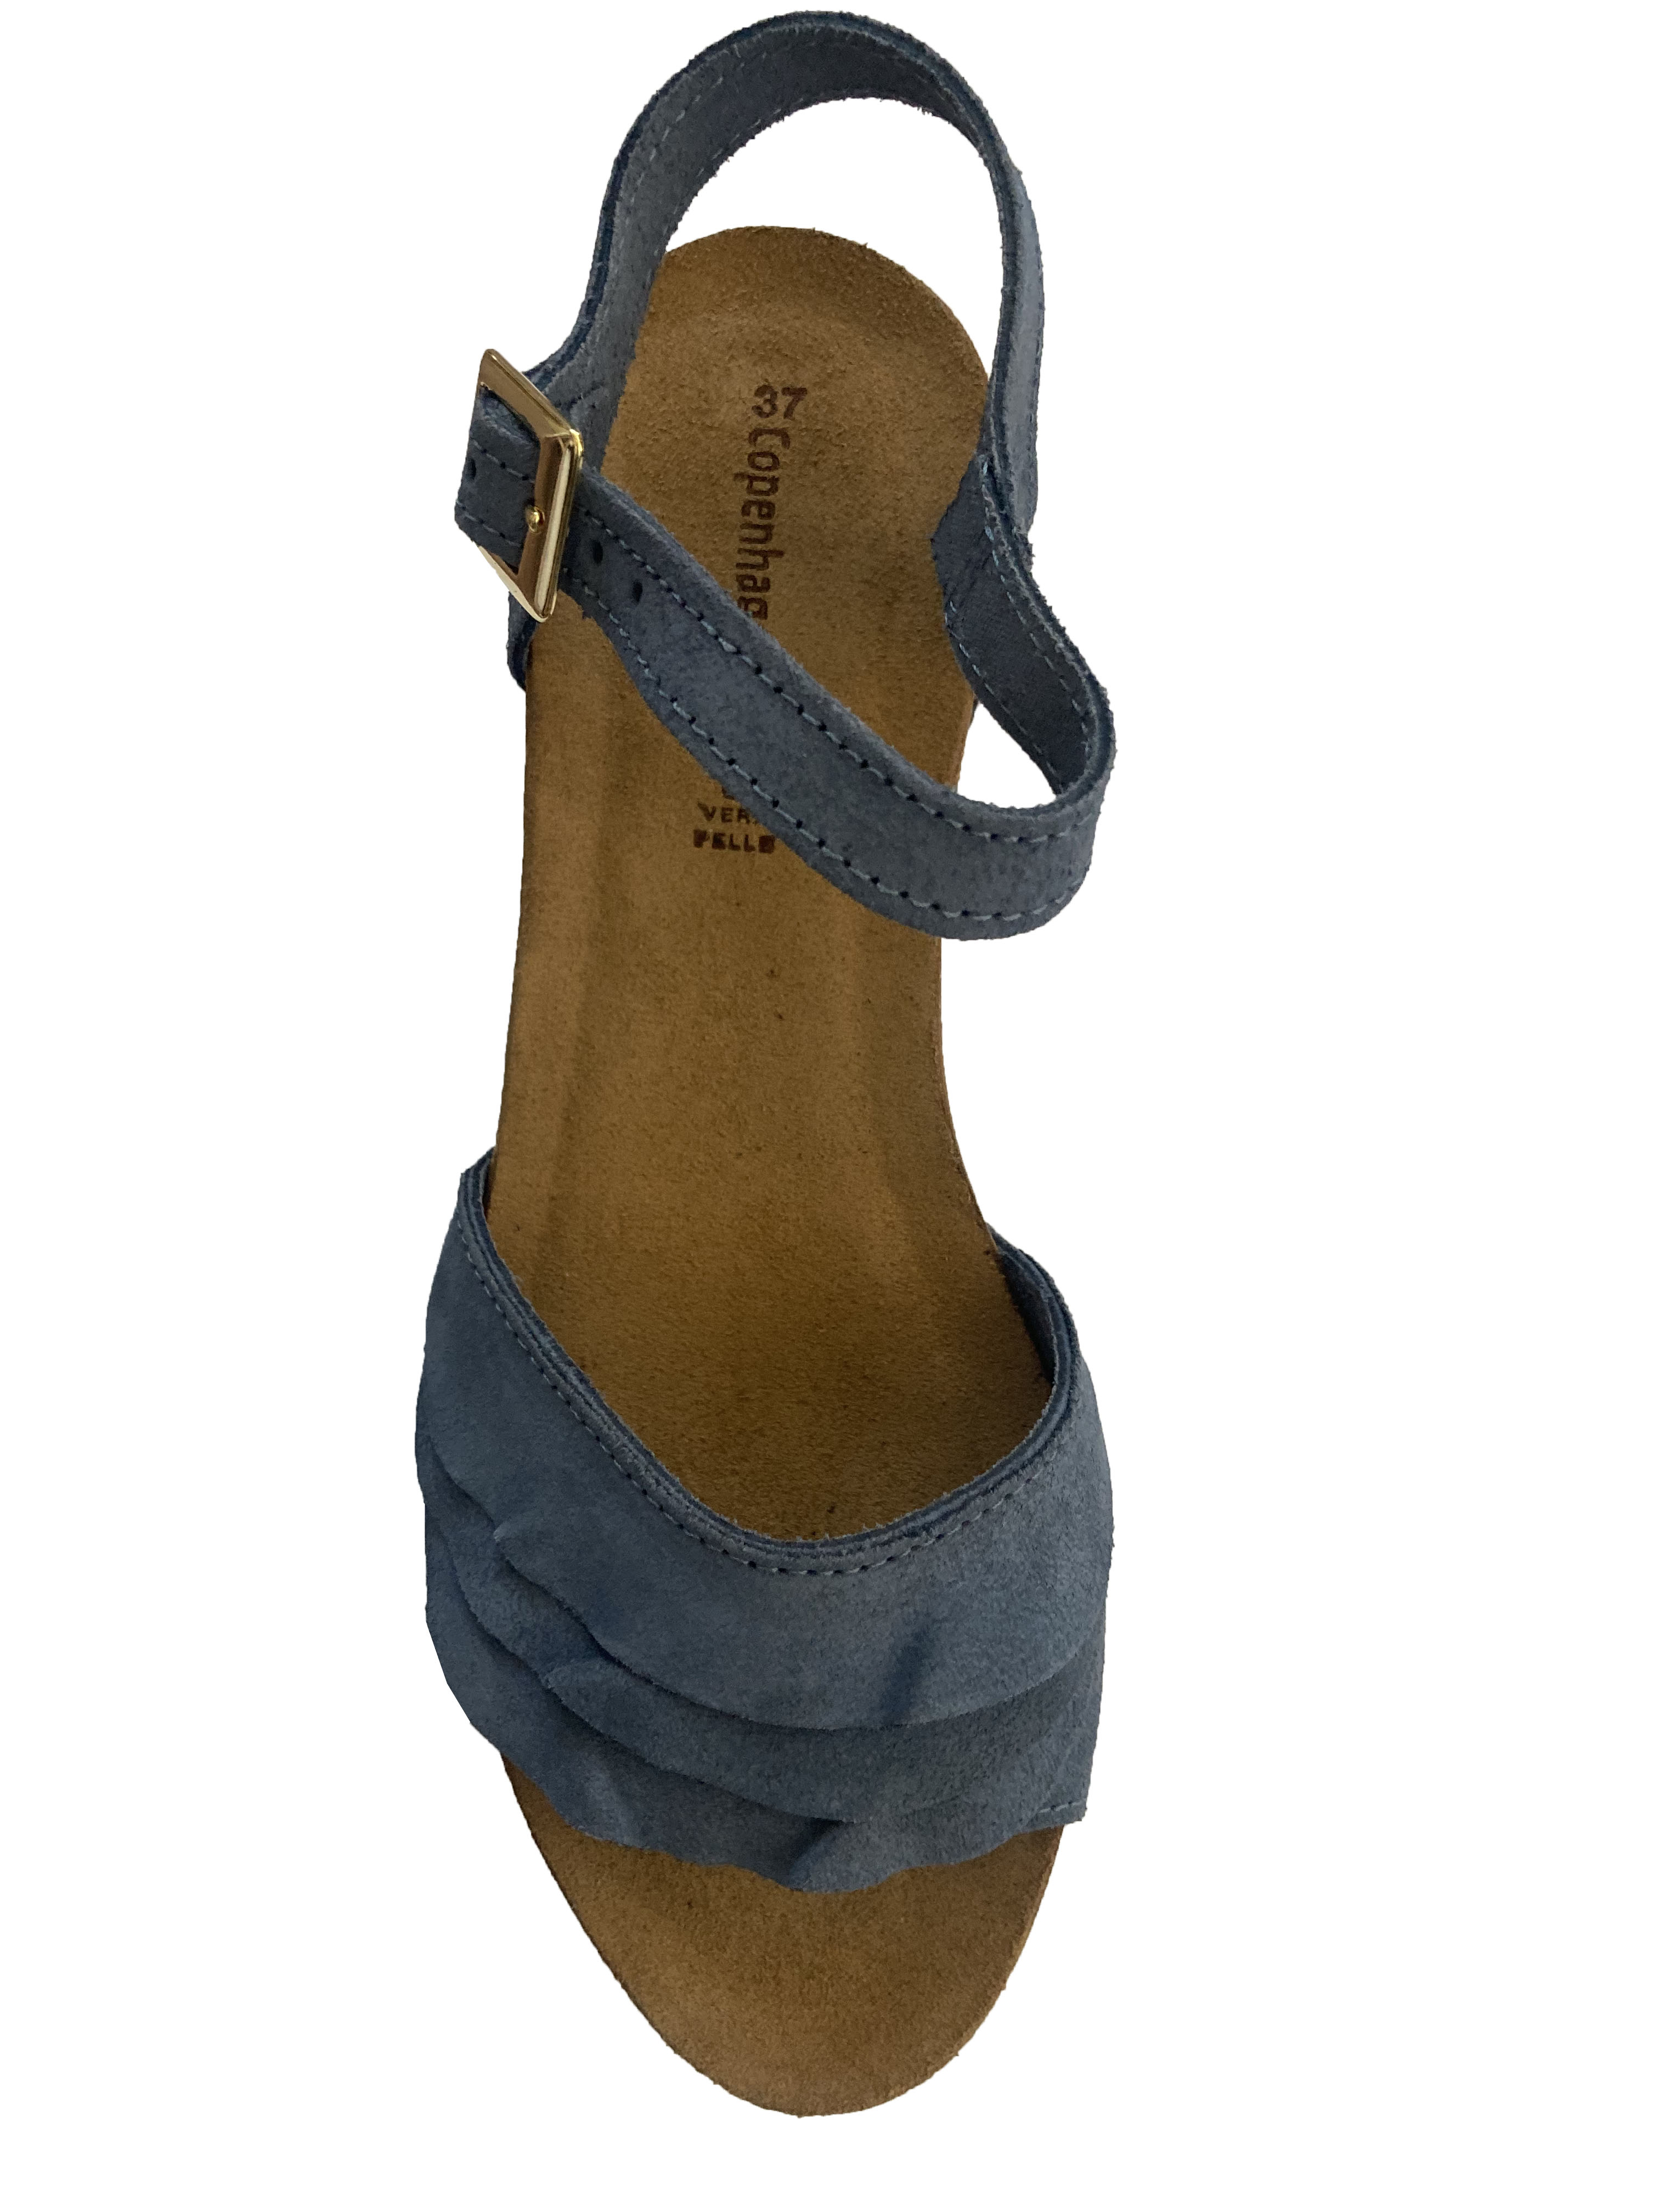 Copenhagen Shoes - Elvira Wedge Sandal Jeans Blue